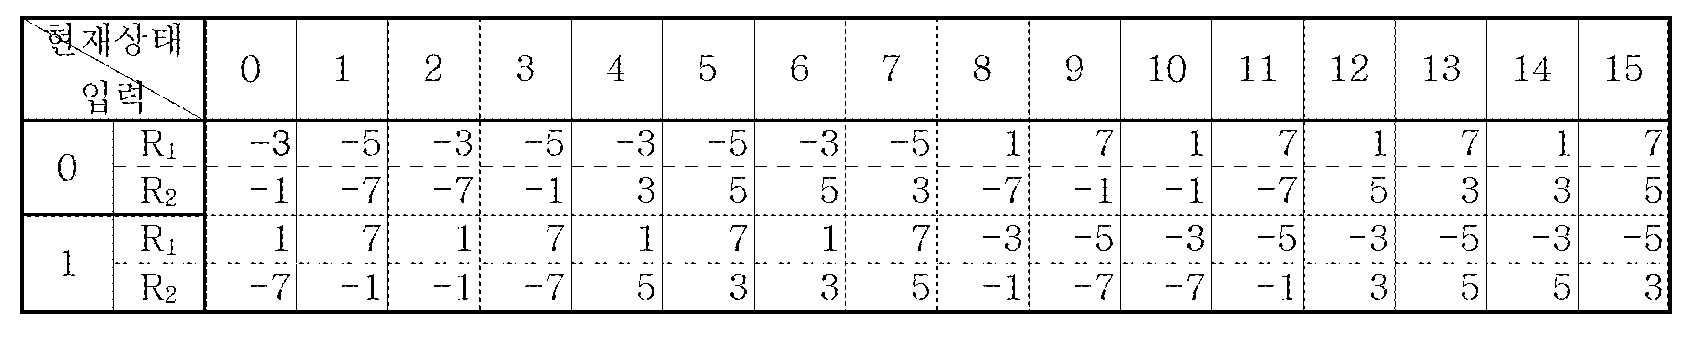 Figure 112005051695892-pat00041